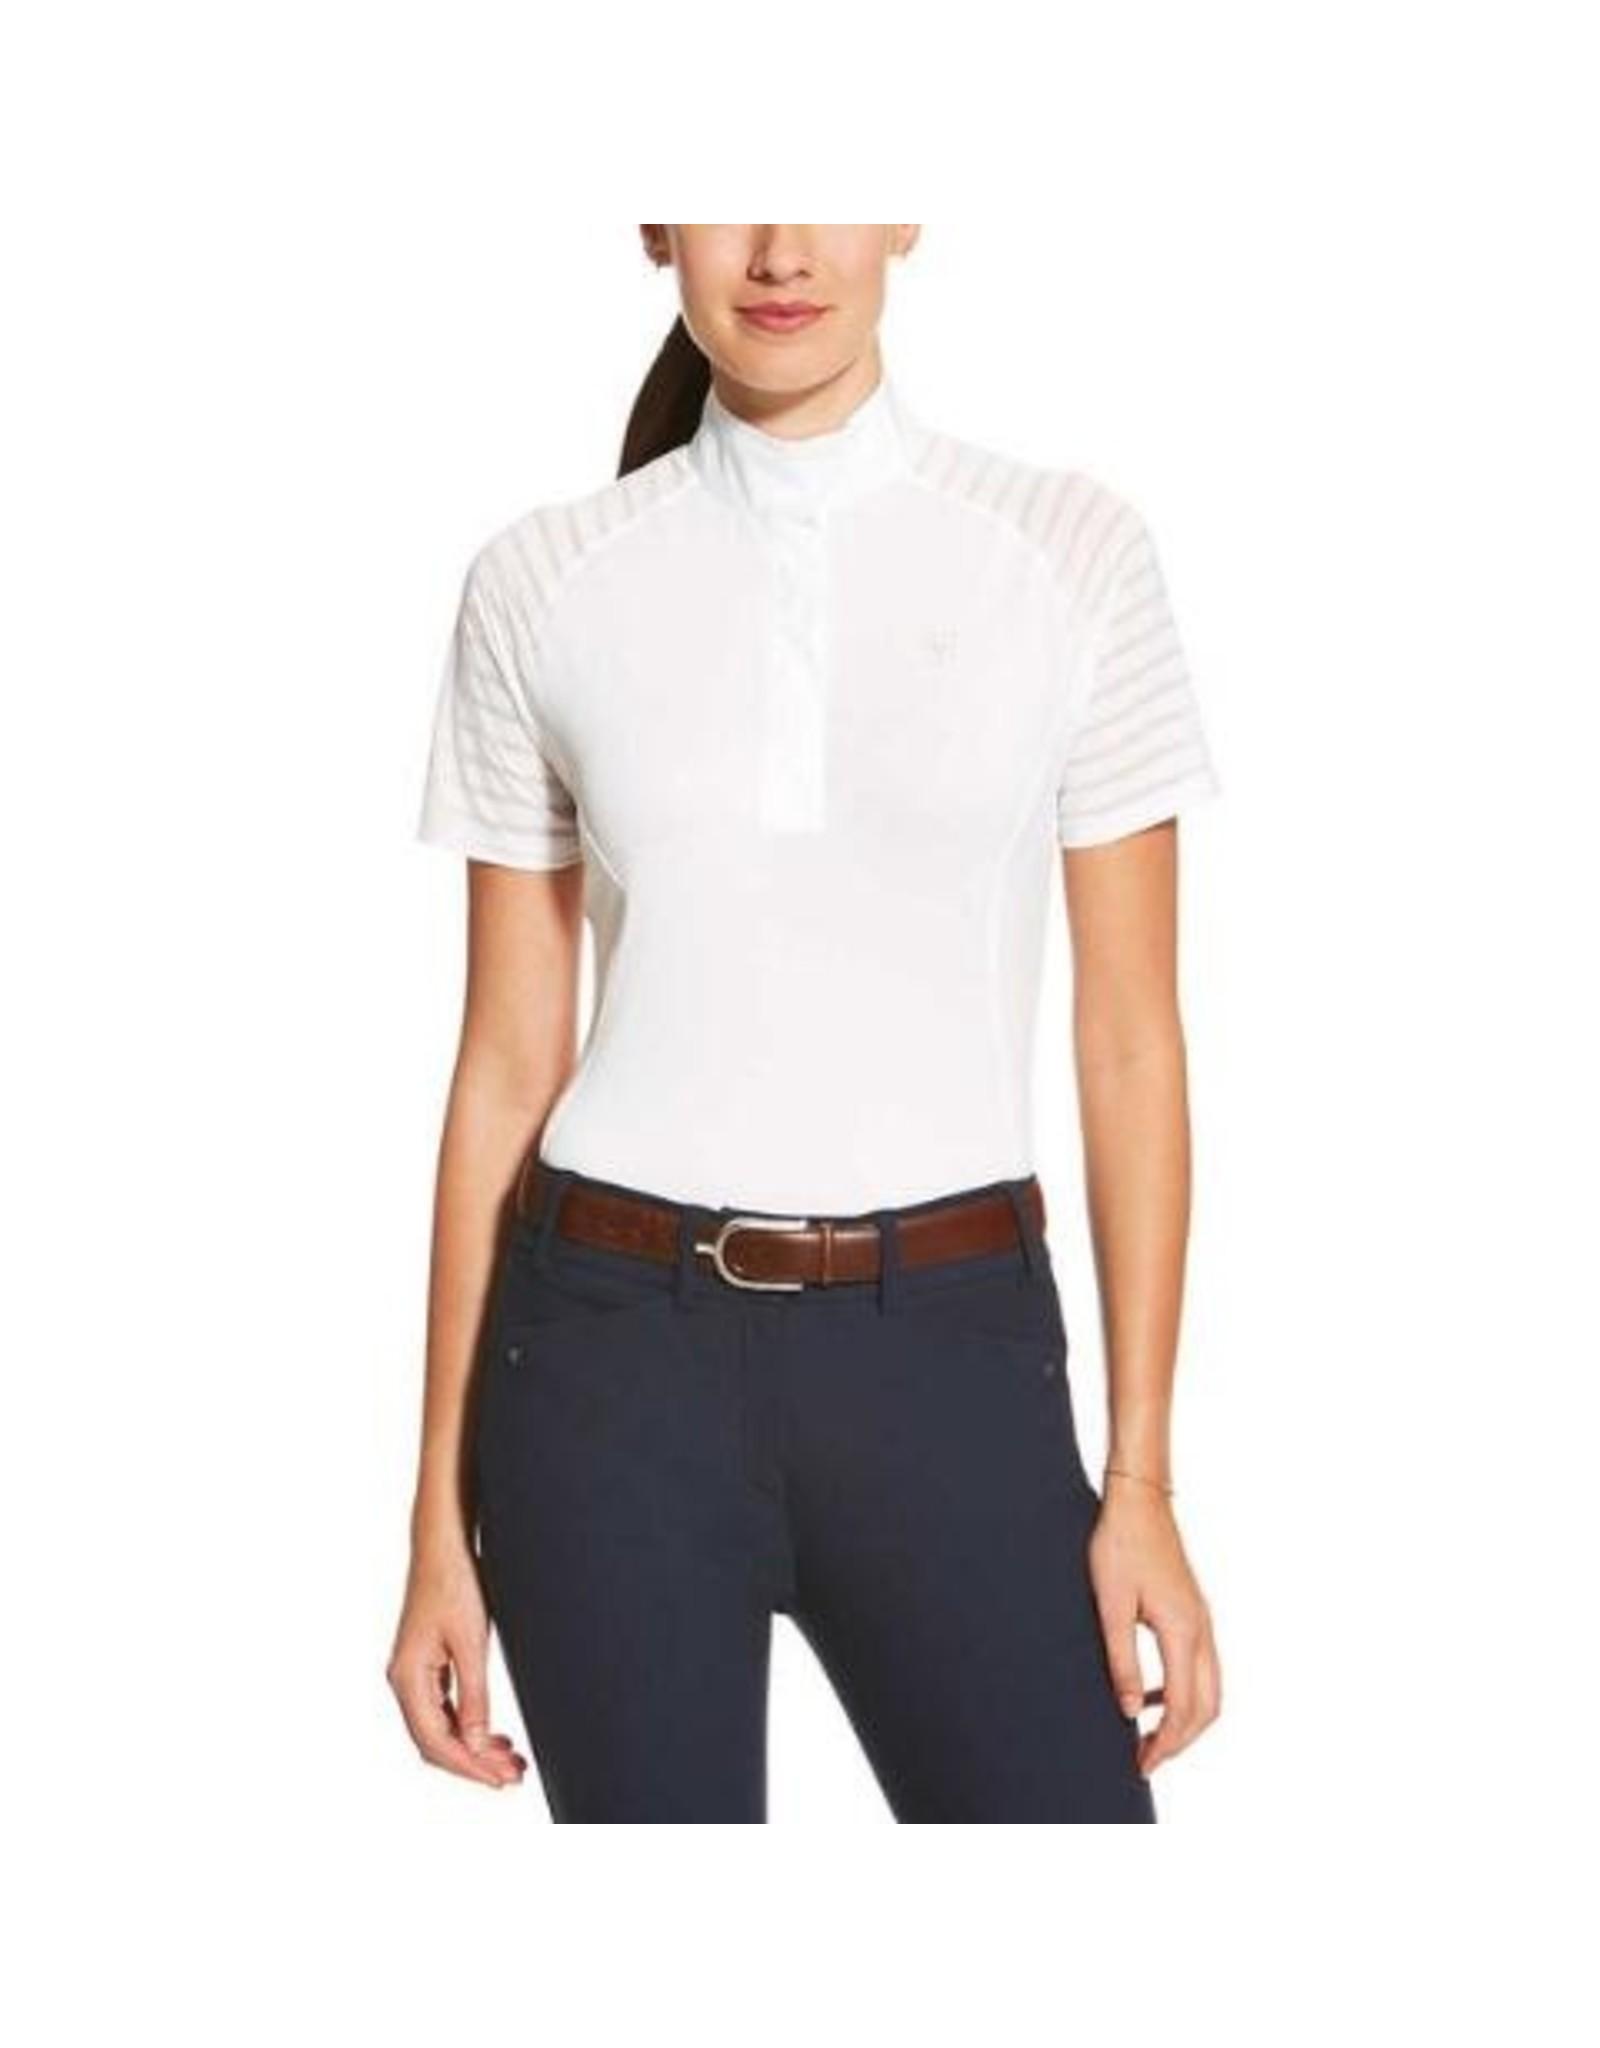 Ariat Show Shirt Ladies Short Sleeve